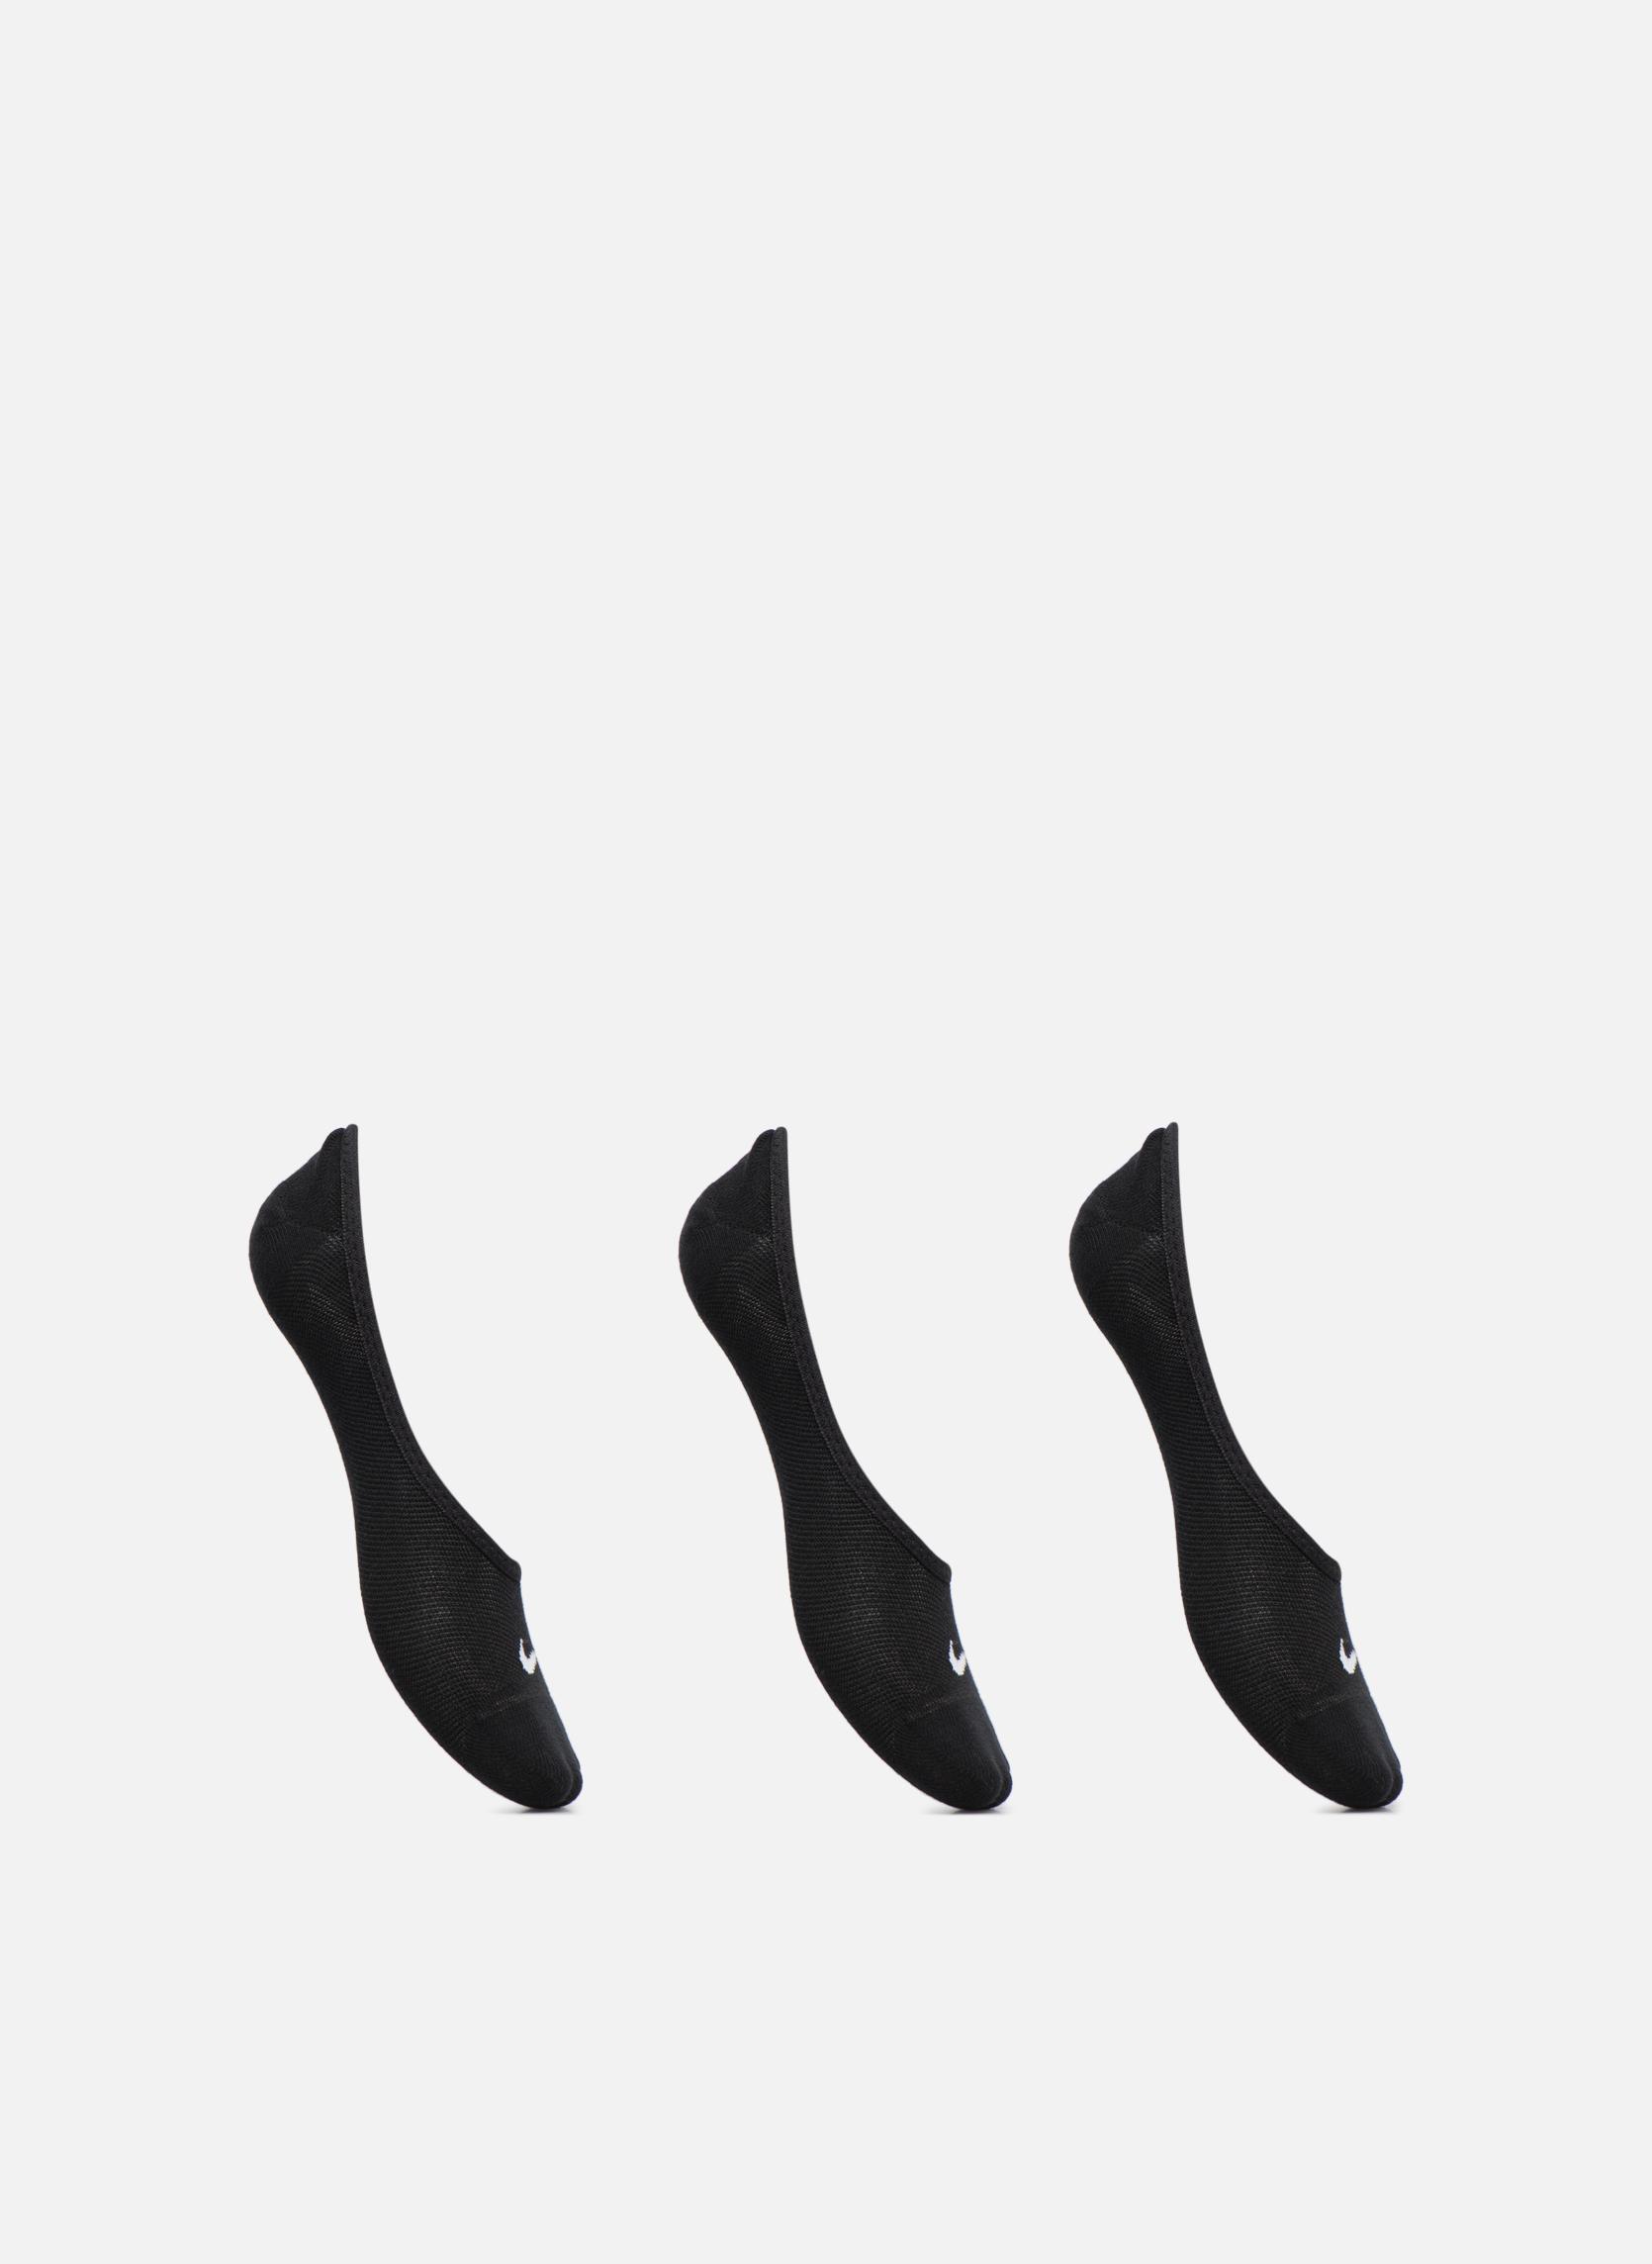 Socks & tights Accessories Sport socks 3PPK WOMEN S LIGHTWEIGHT FOOTI Pack of 3